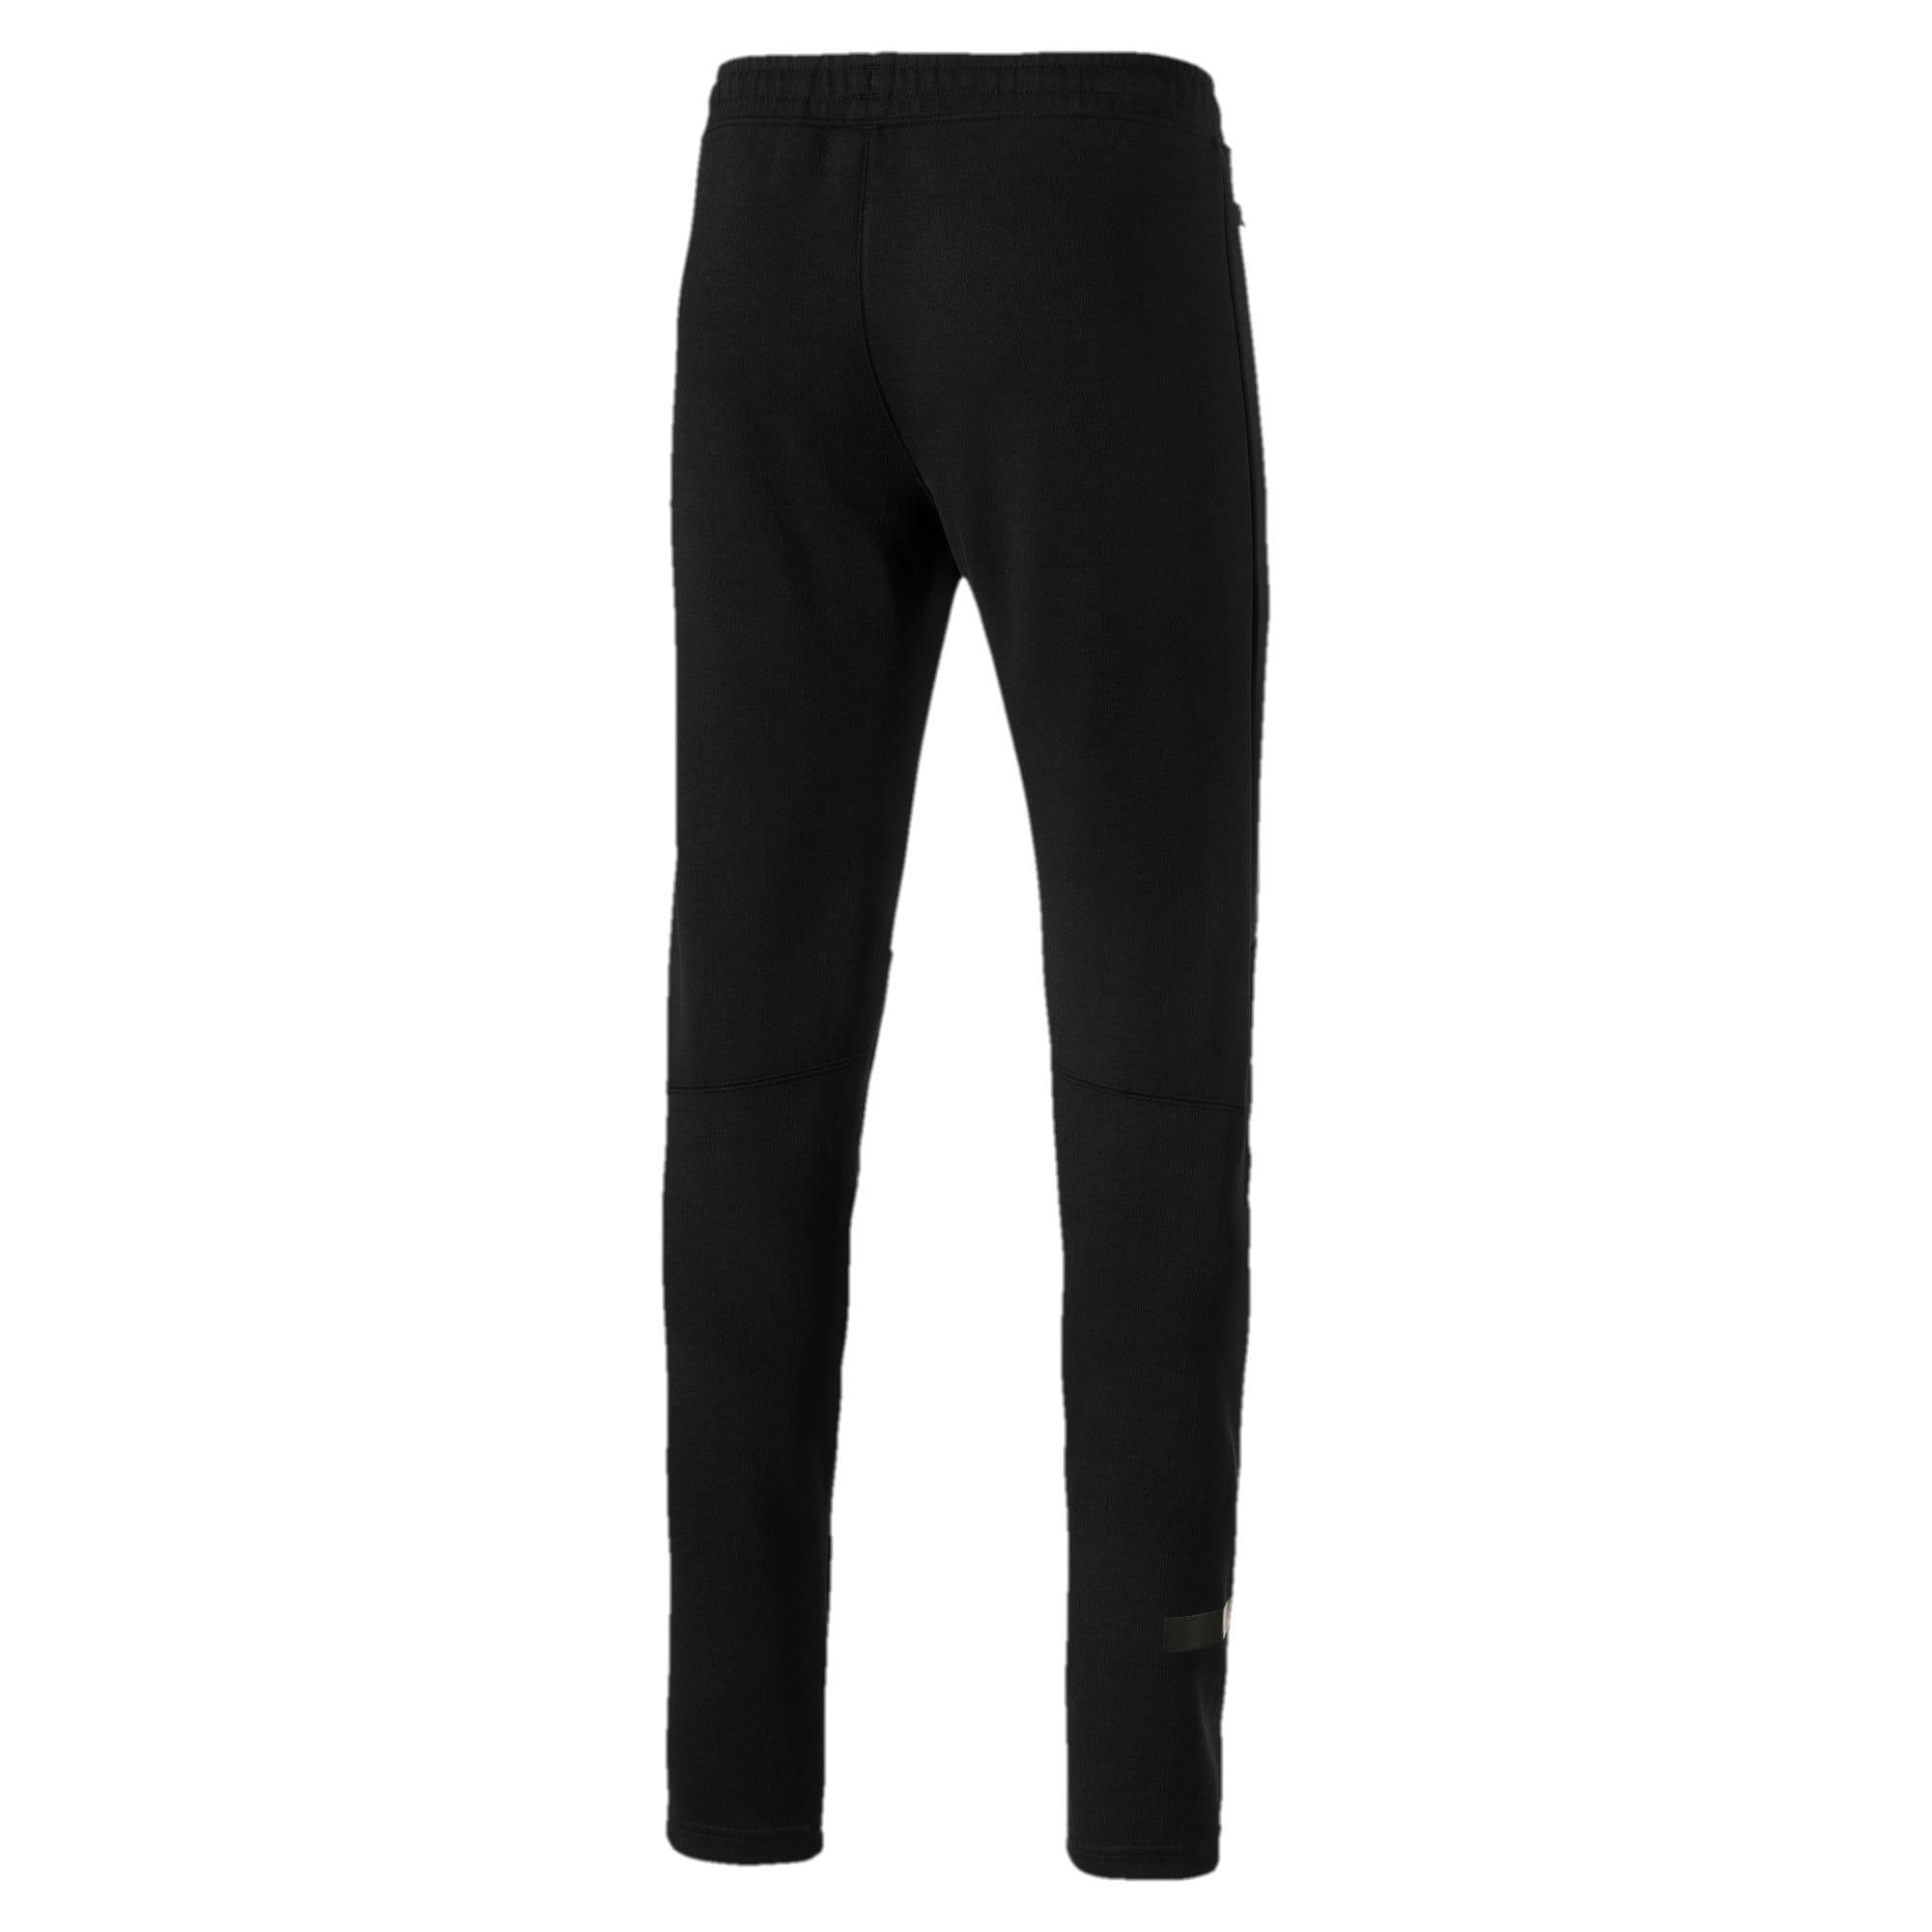 Thumbnail 5 of Mercedes AMG Petronas Knitted Men's Sweatpants, Puma Black, medium-IND